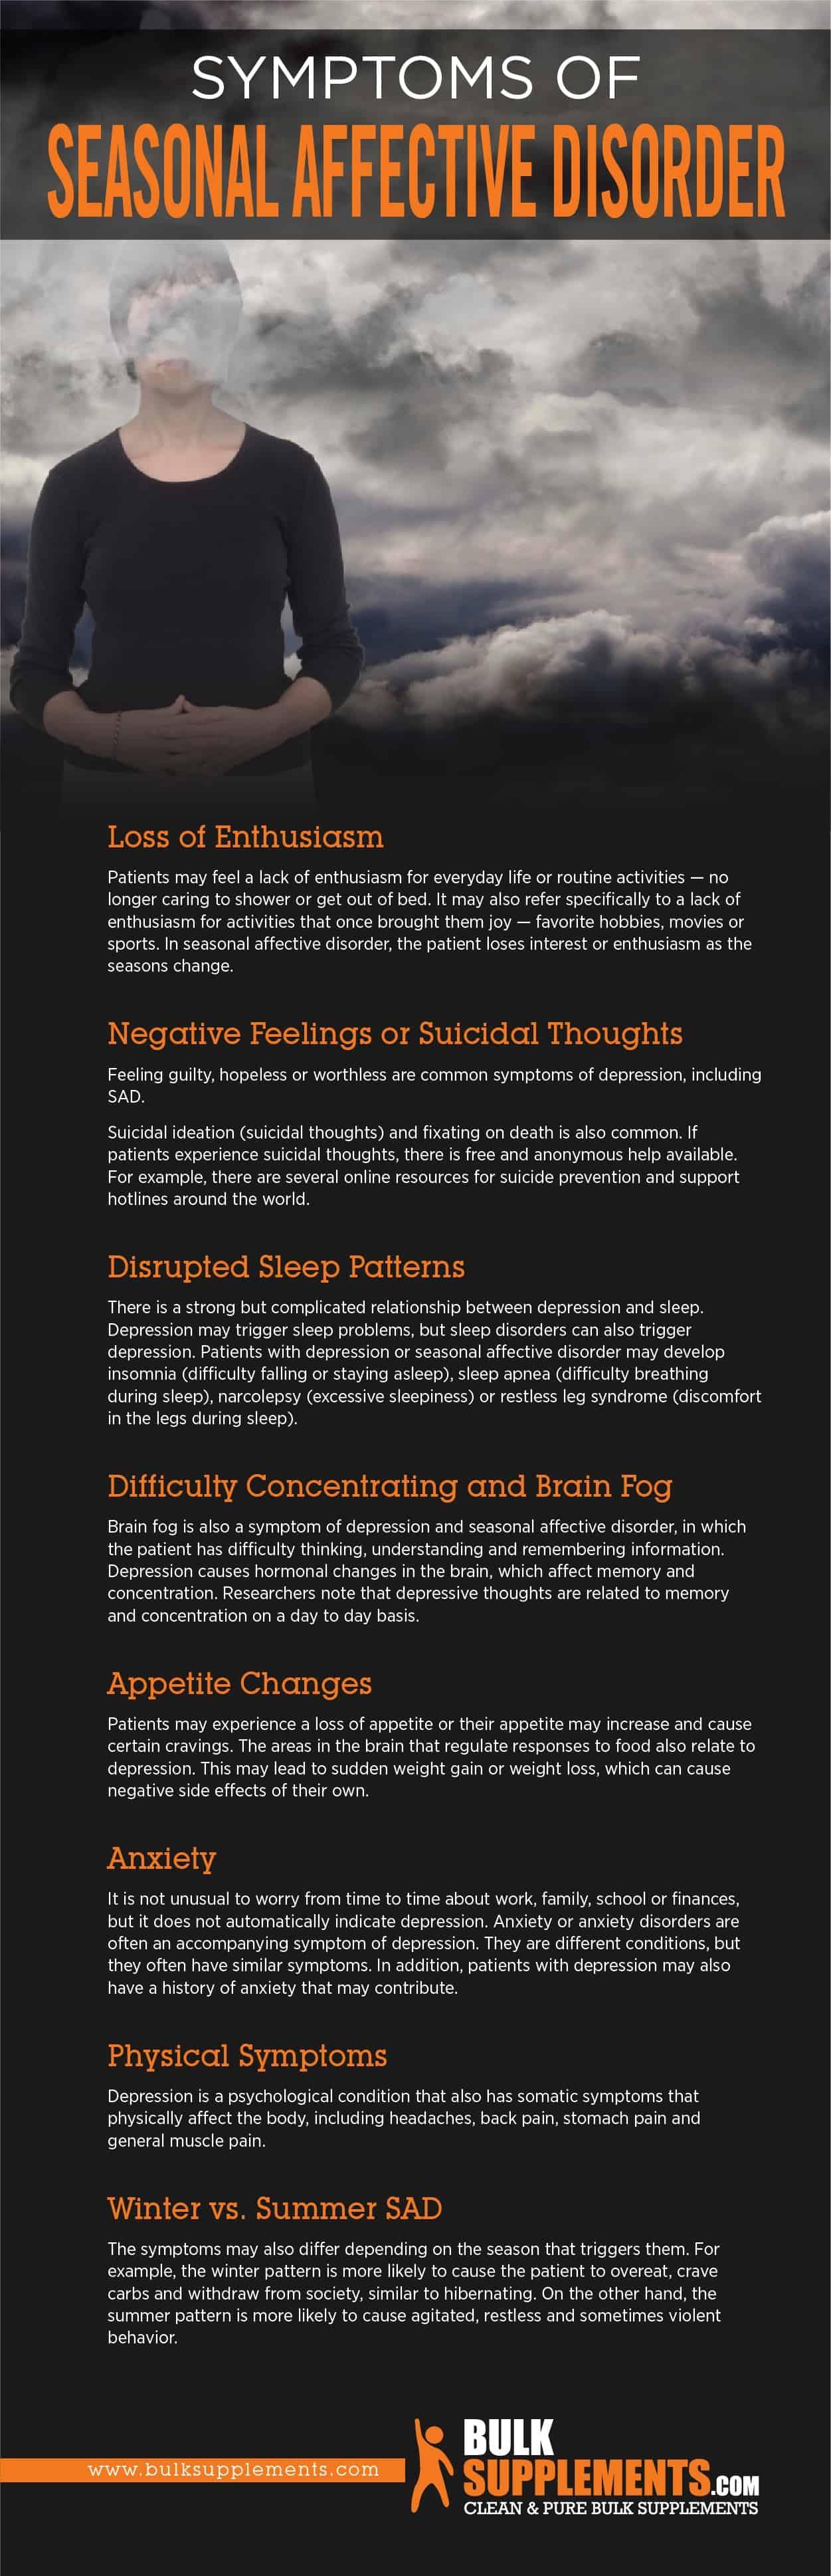 Symptoms of Seasonal Affective Disorder